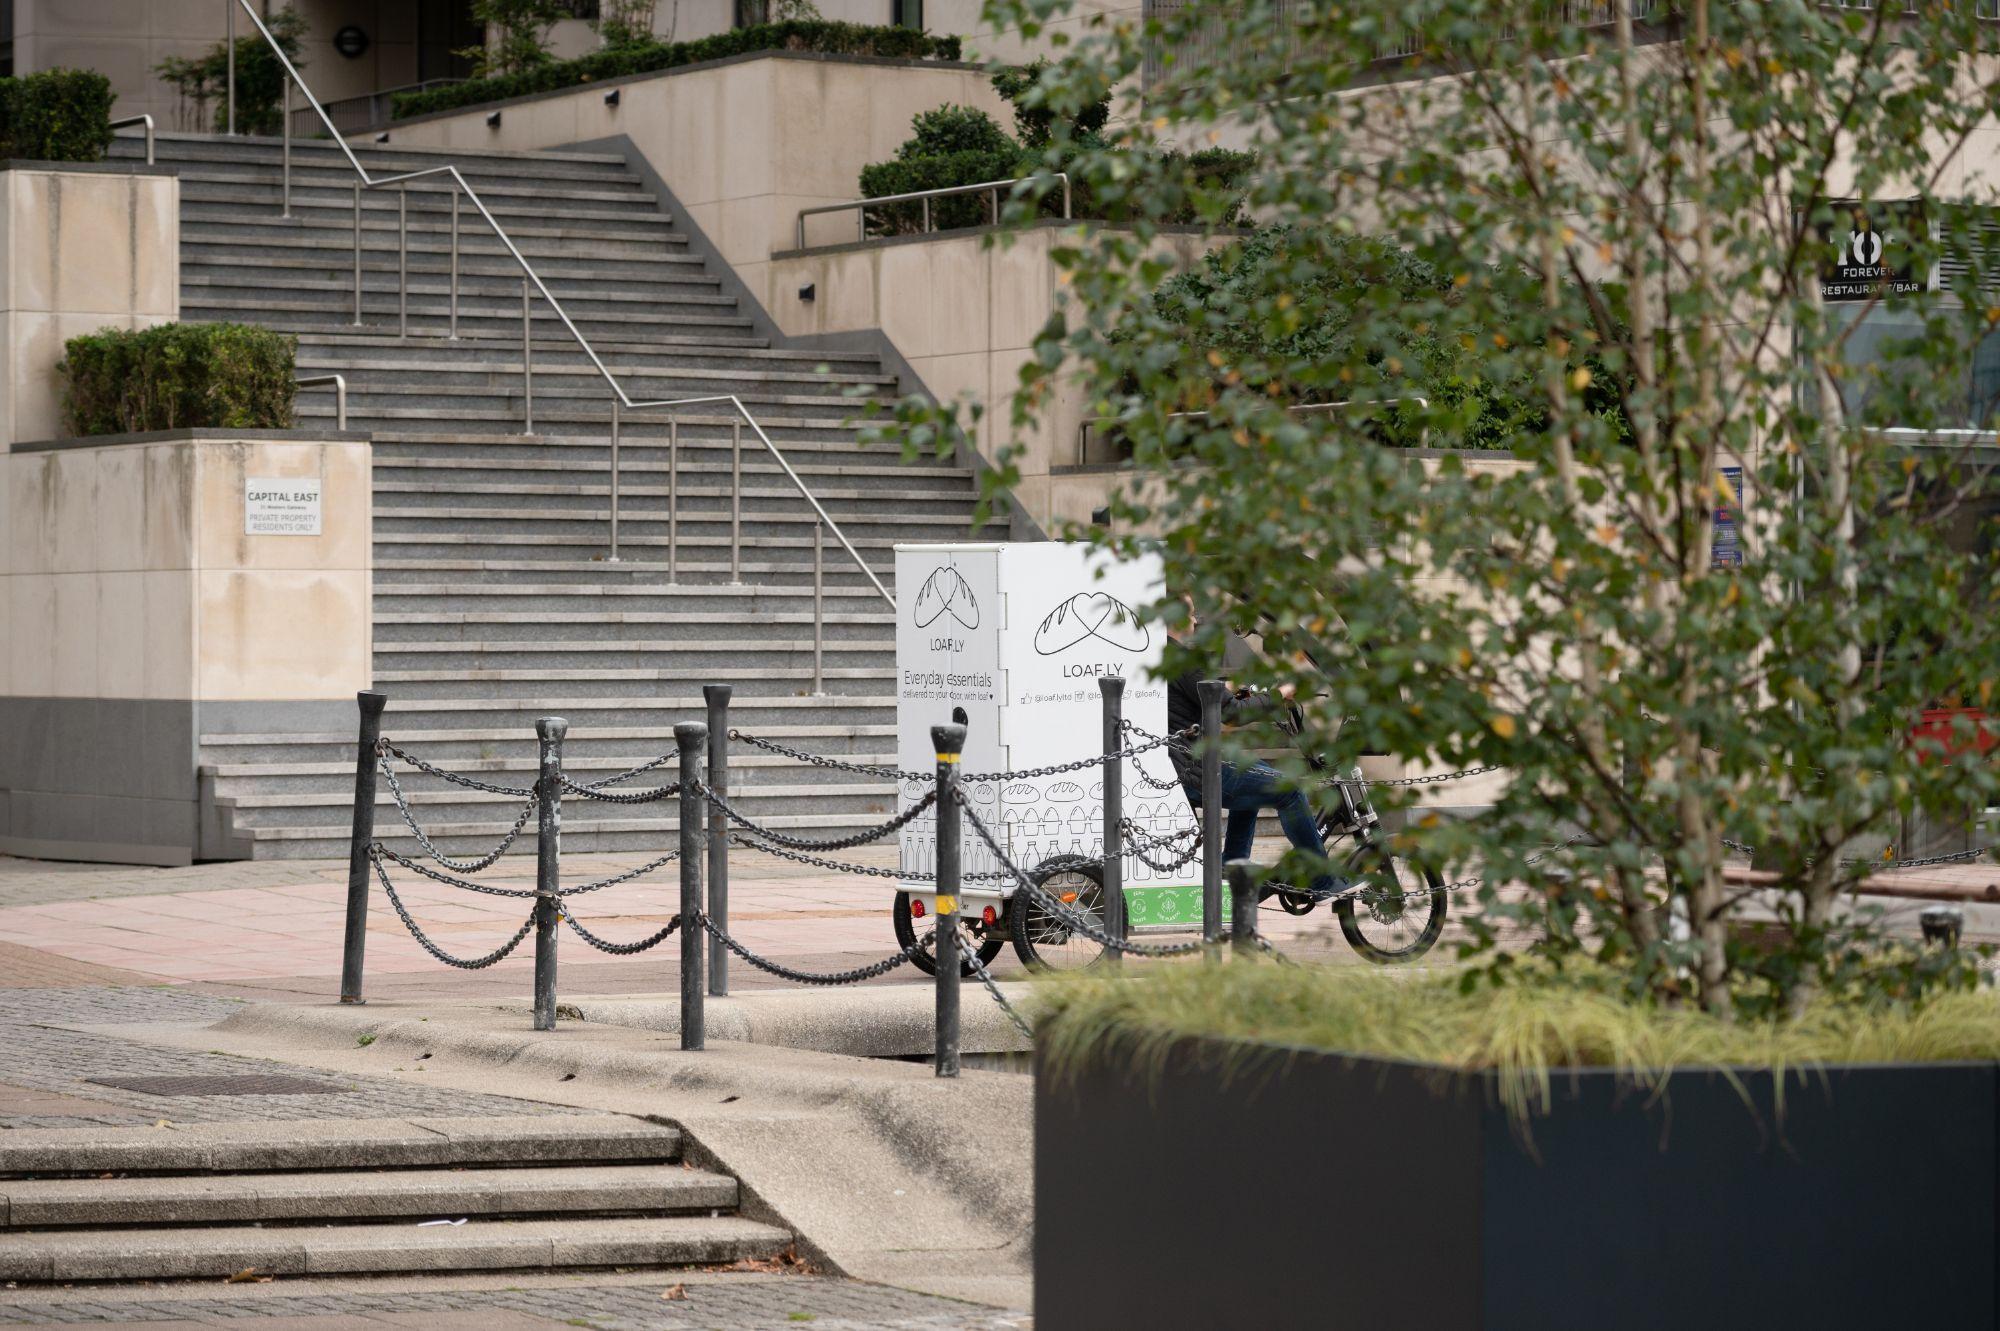 Loafly bike among trees in the Royal Docks